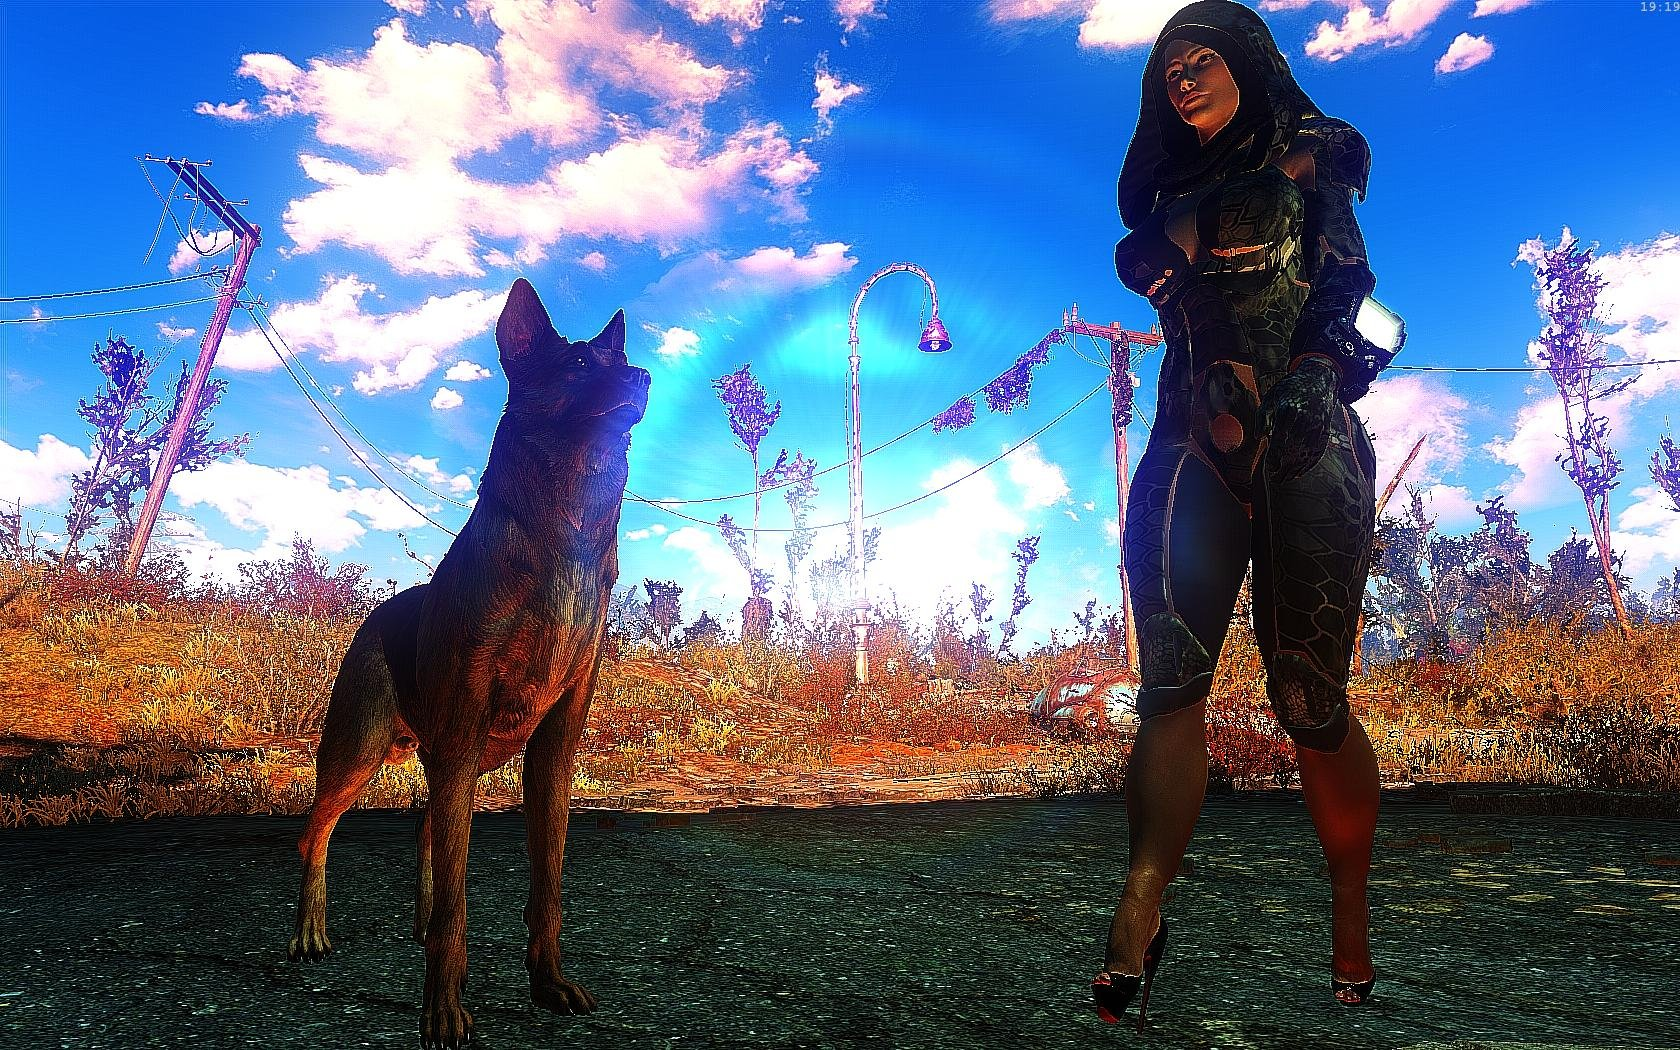 Fallout4 2019-01-15 19-19-58-42